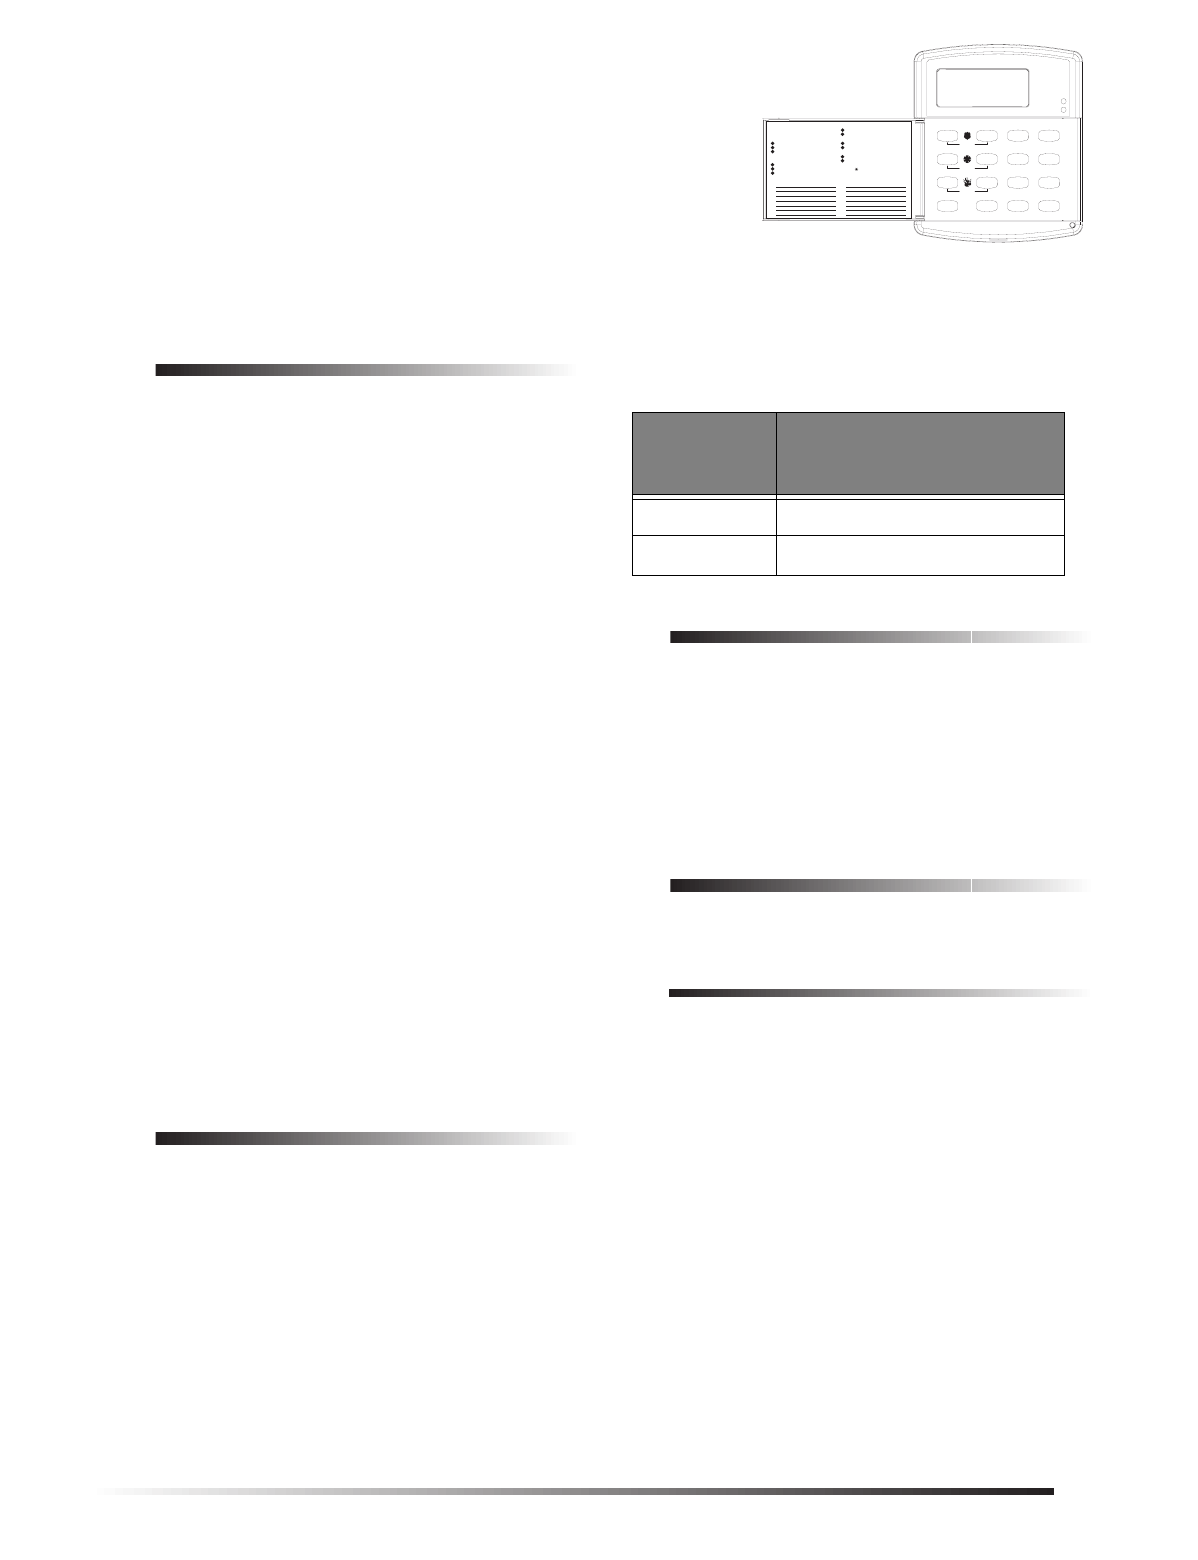 4661668b 60 820 Install Guide Diagram Wiring Iti Concord 1